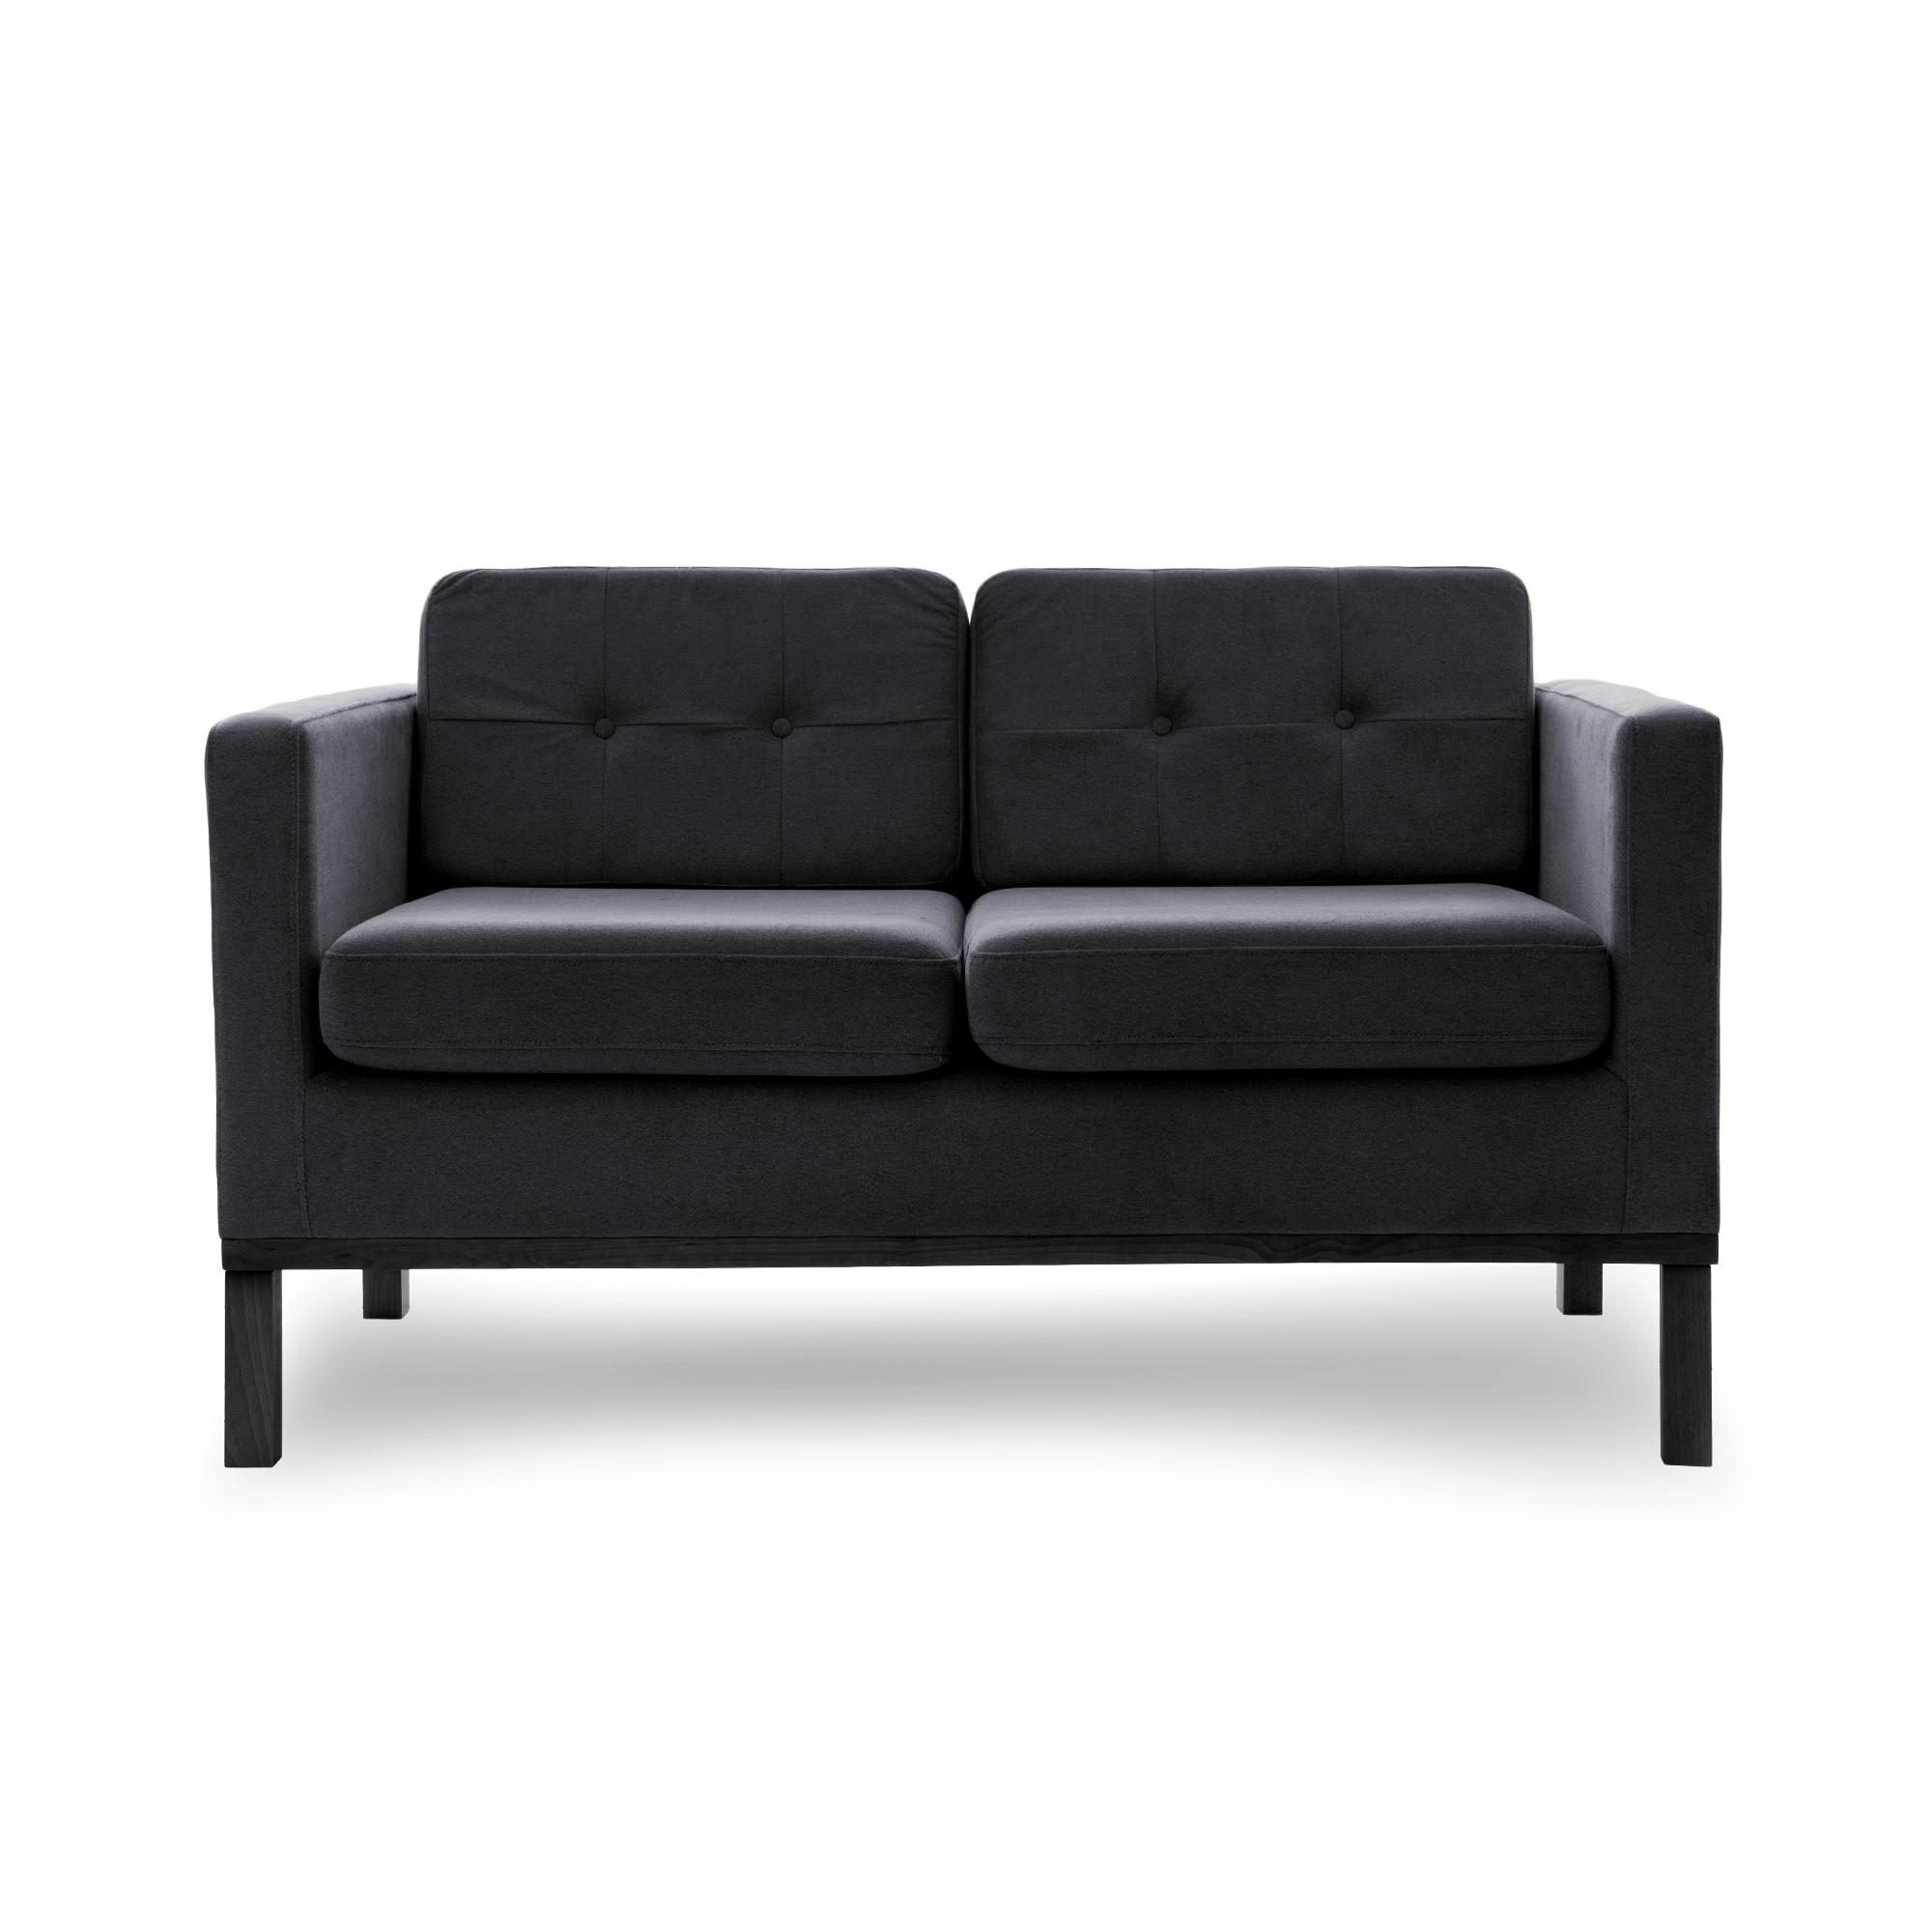 Canapea Fixa 2 locuri Jonan Dark Grey/Black